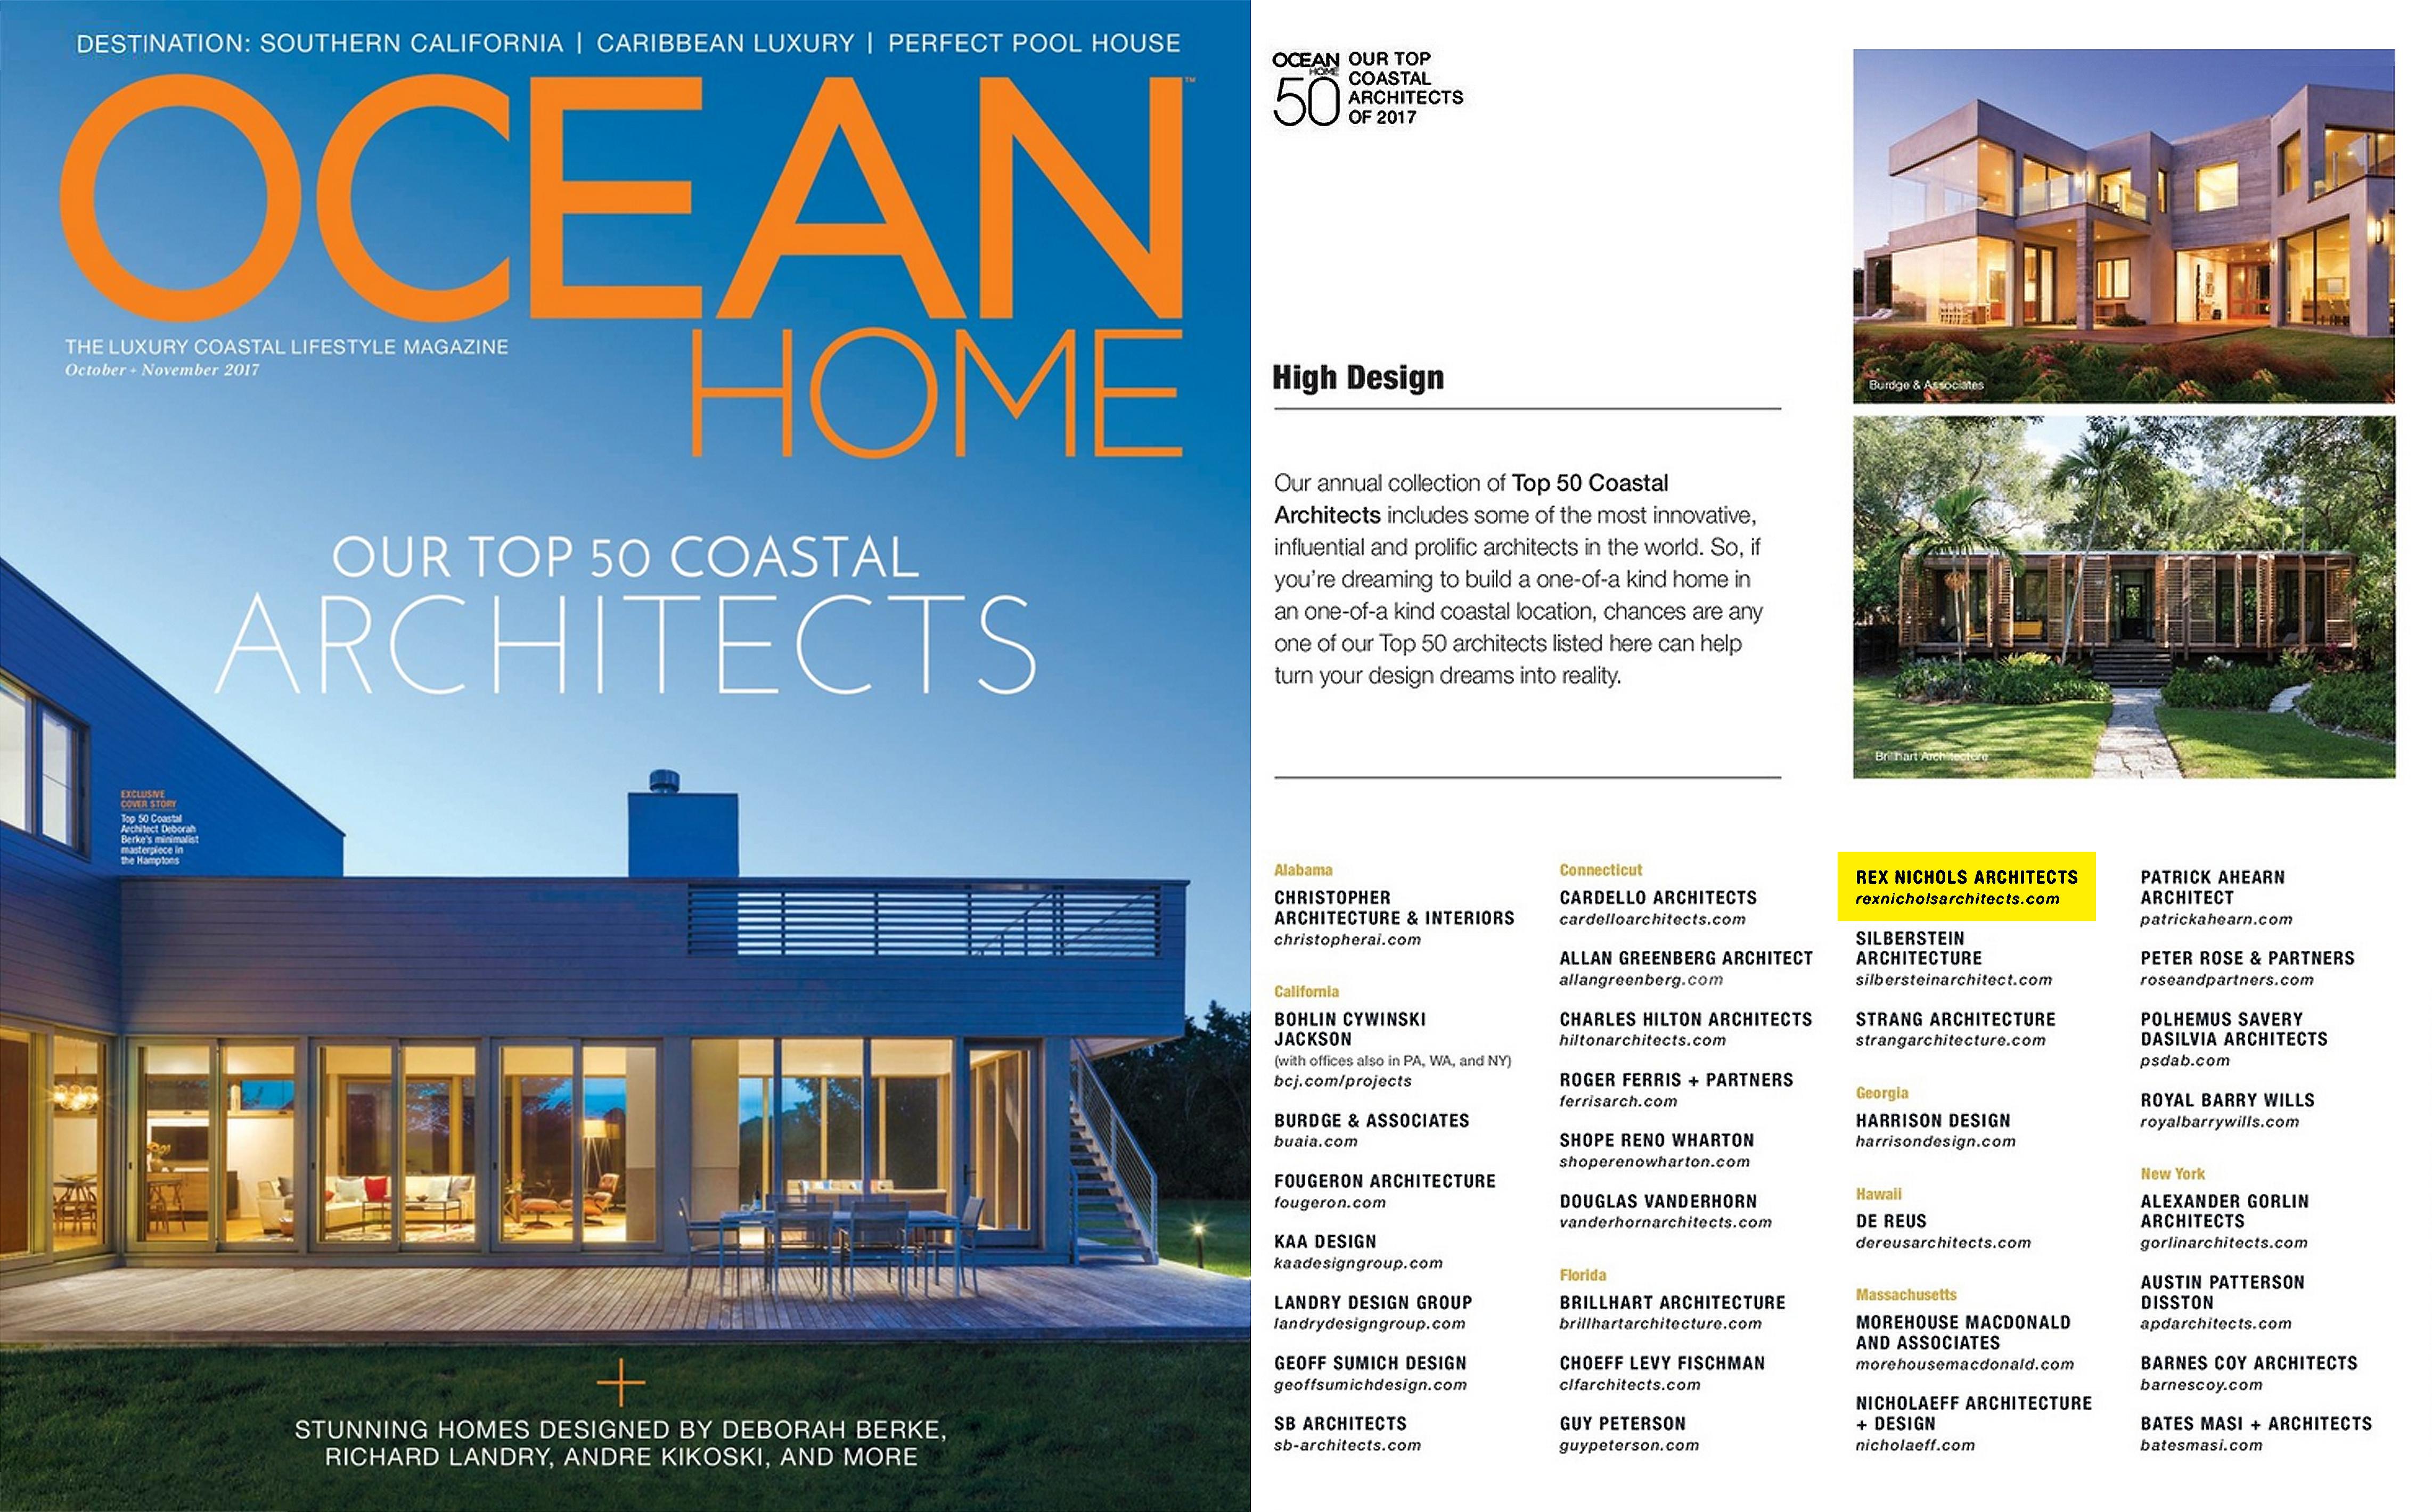 Top 50 Coastal Architects of 2017